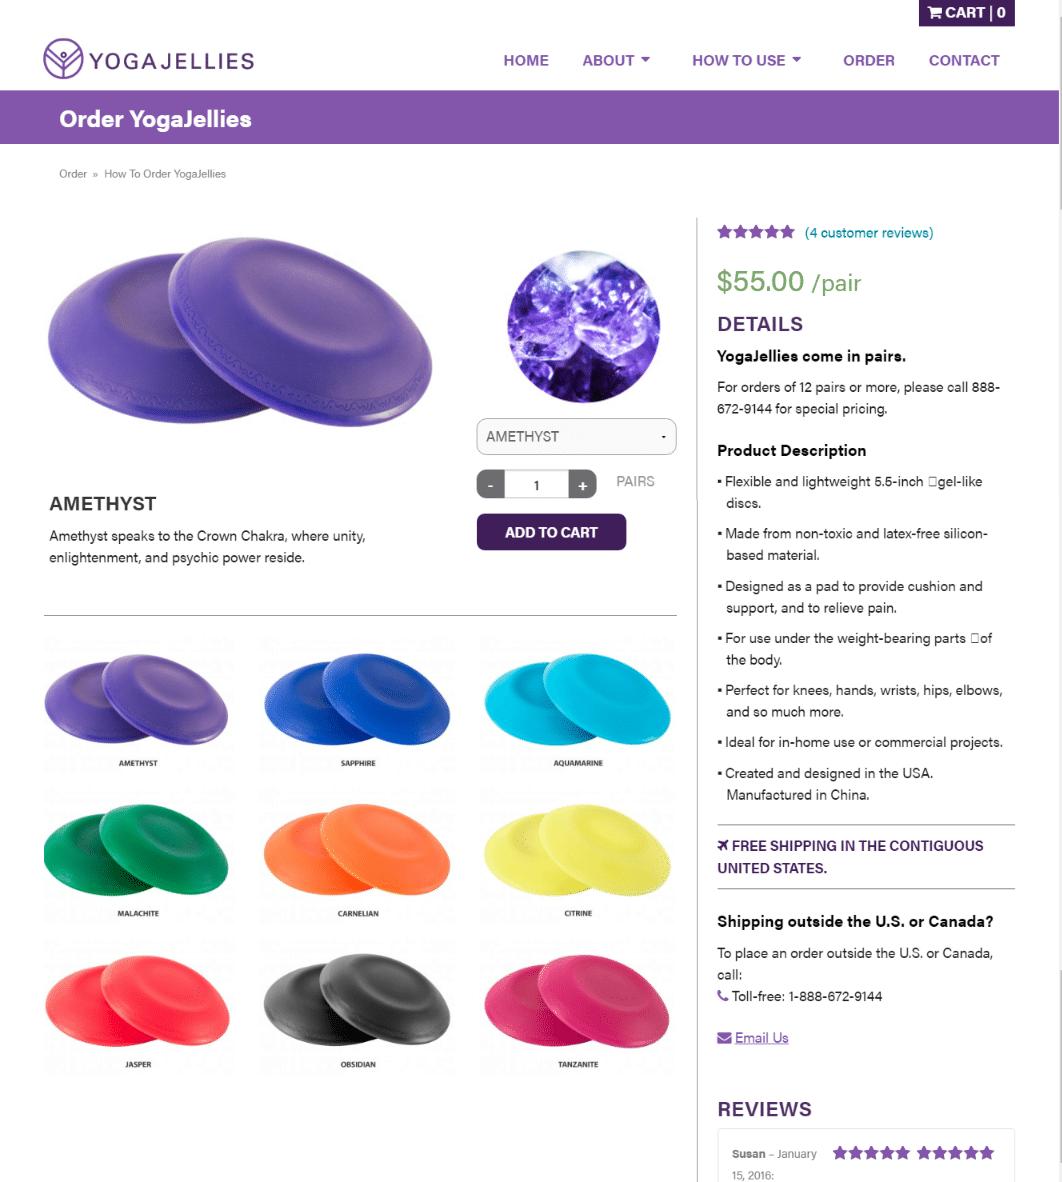 Yoga Jellies Shop Page